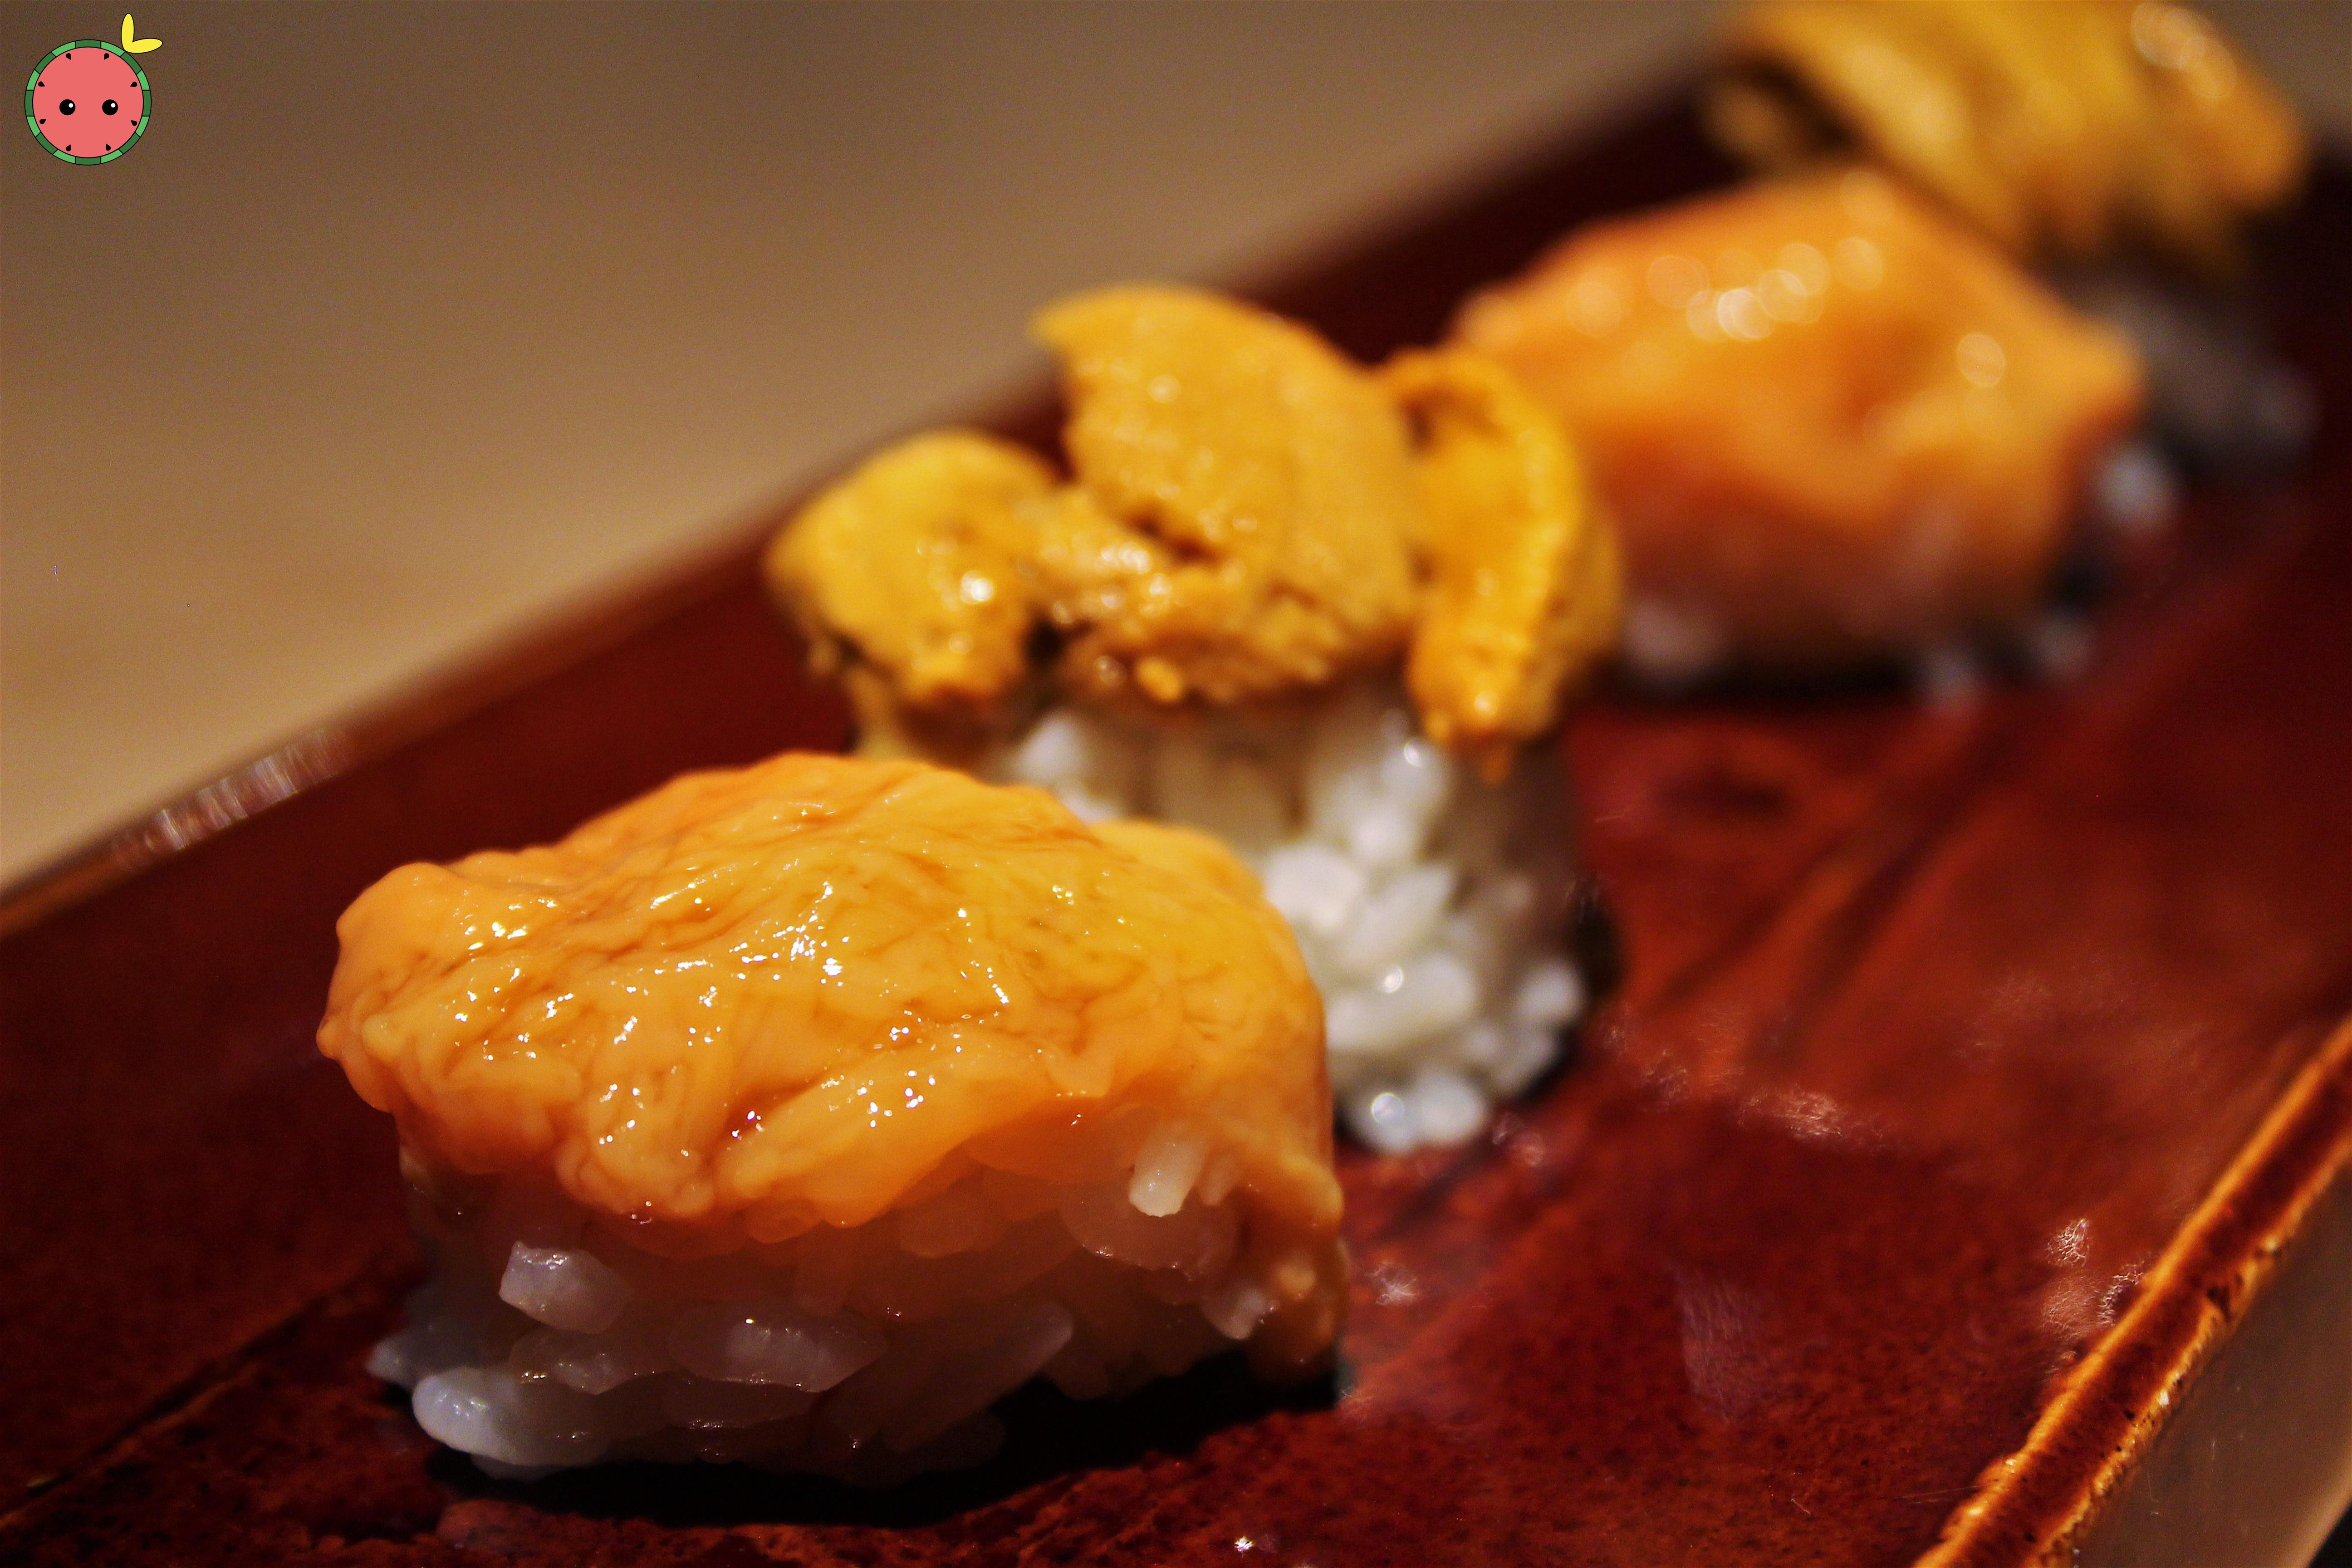 Konowata (sea cucumber innards) and uni from Hokkaido